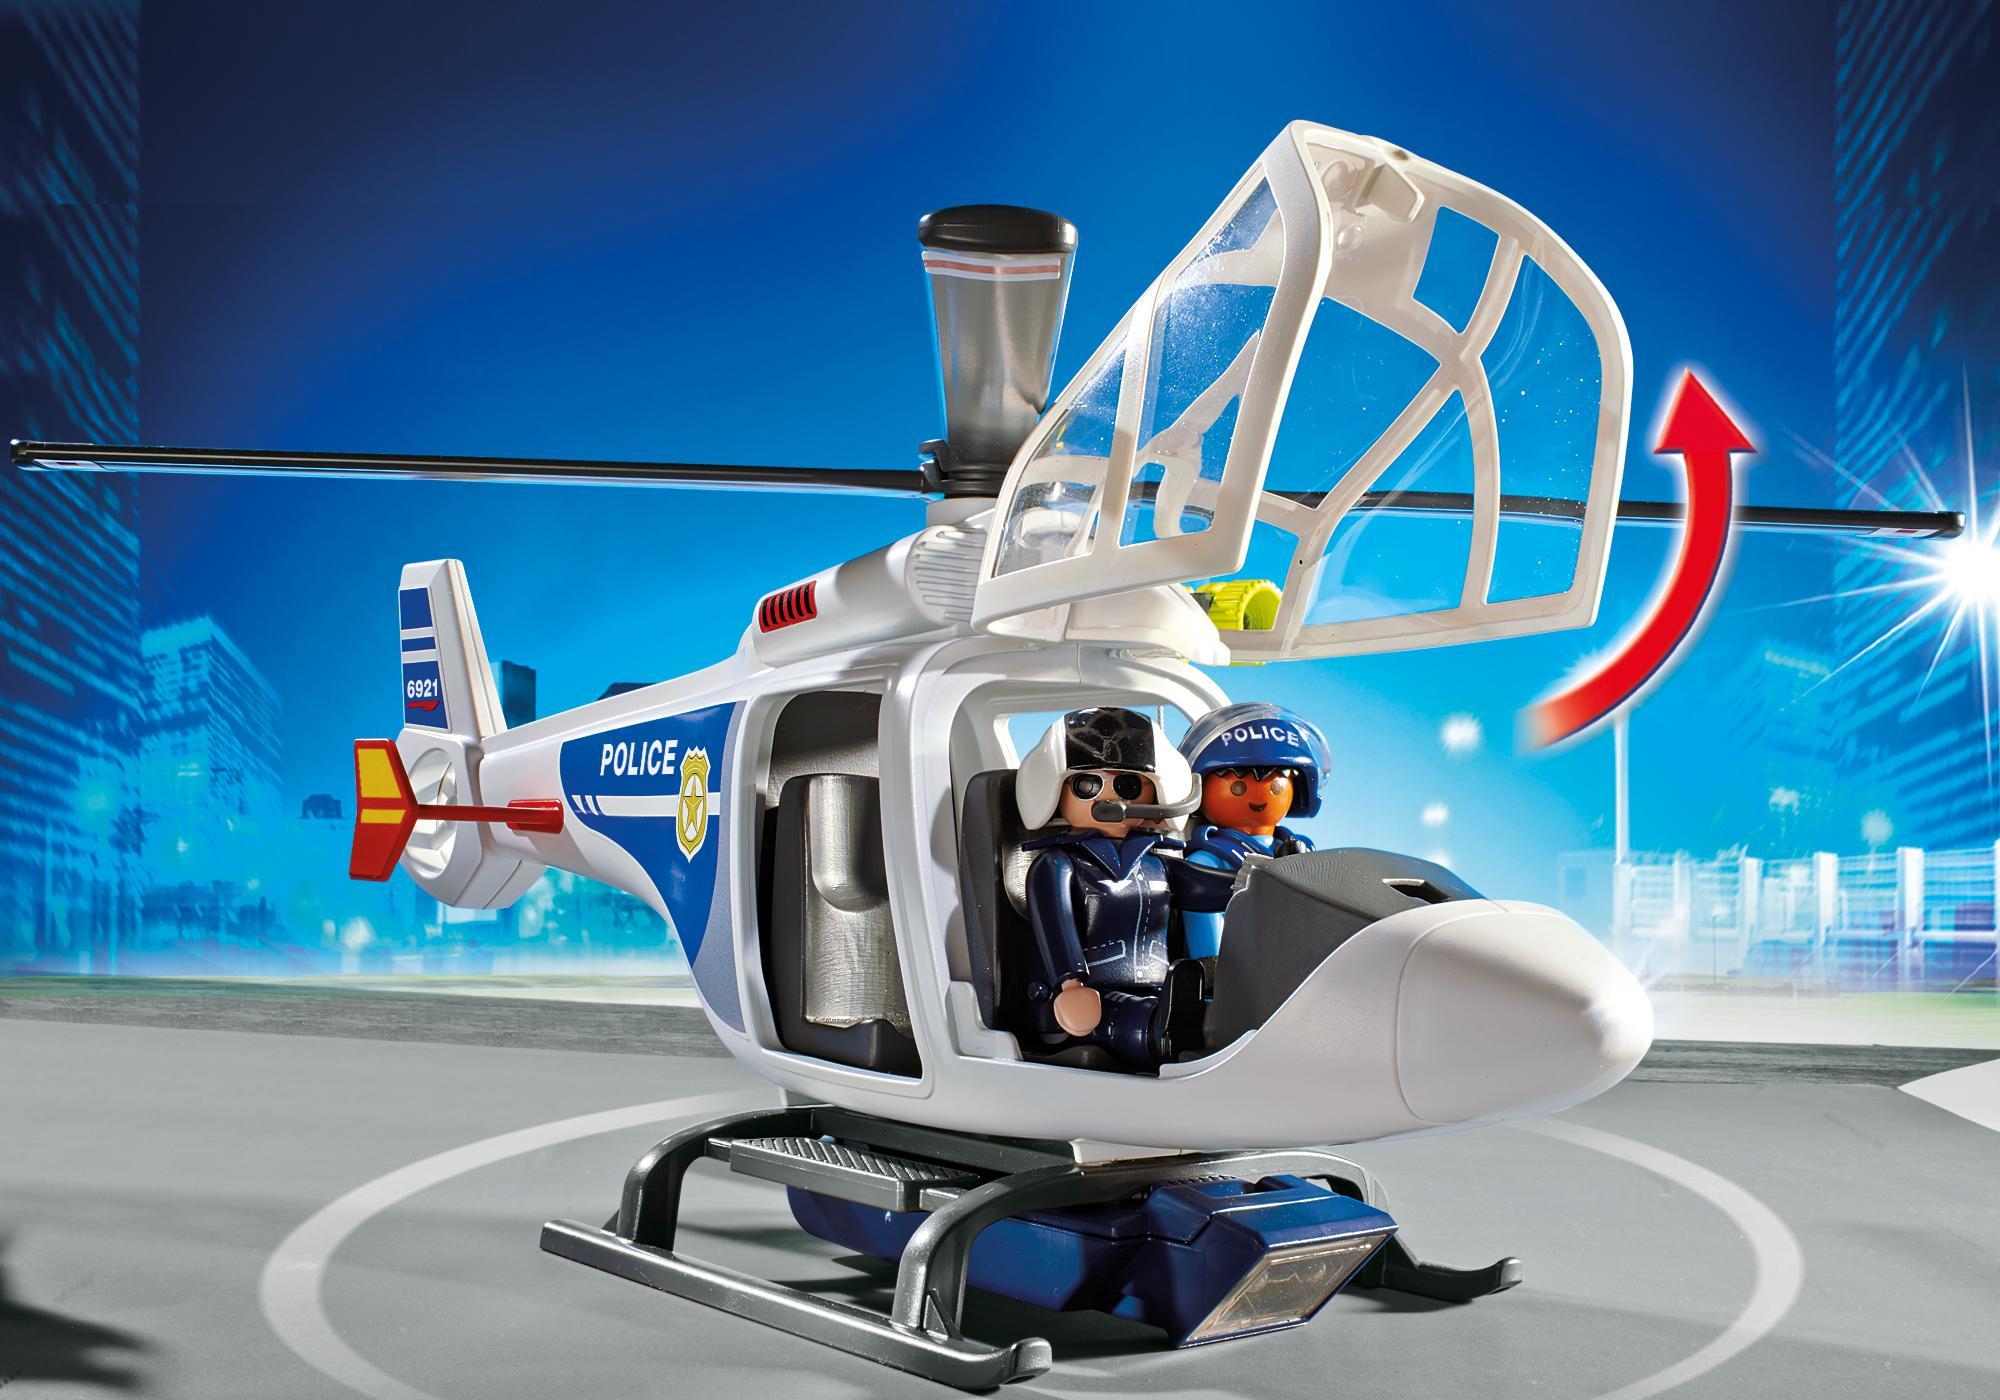 http://media.playmobil.com/i/playmobil/6921_product_extra1/Helikopter policyjny z reflektorem LED